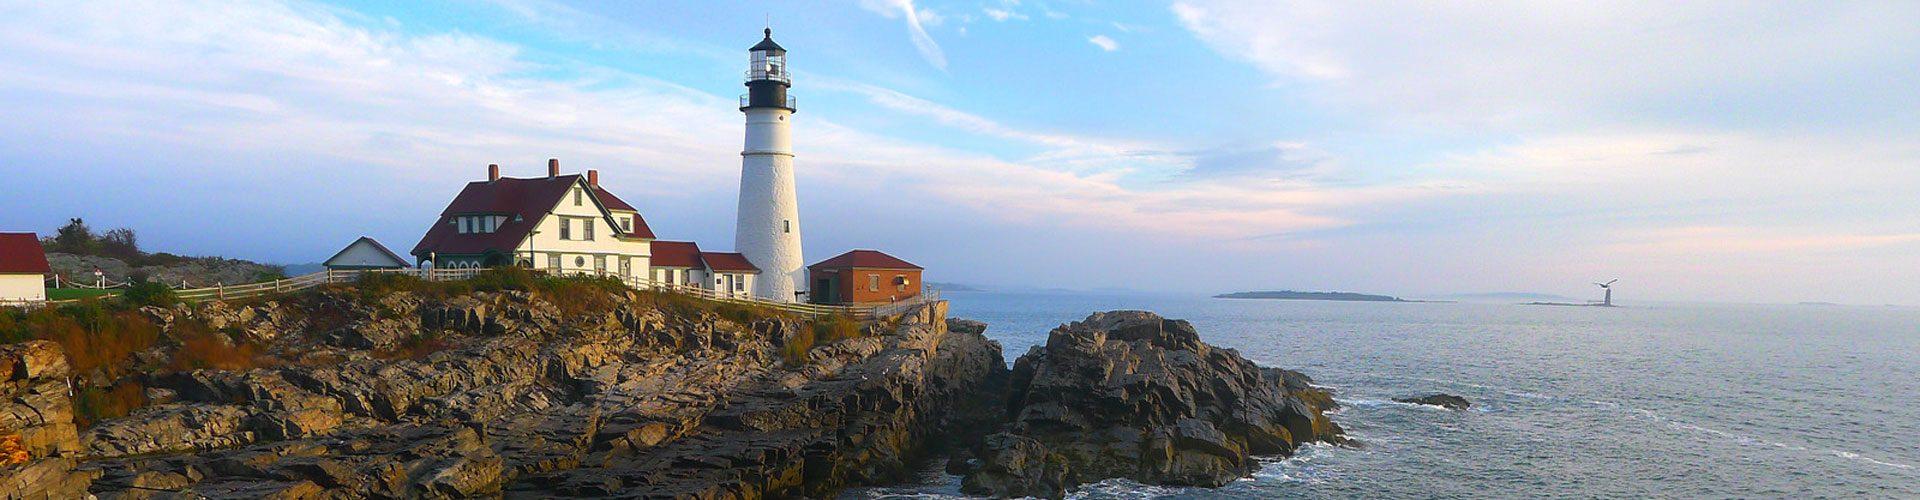 Leuchtturm in Portland, Maine